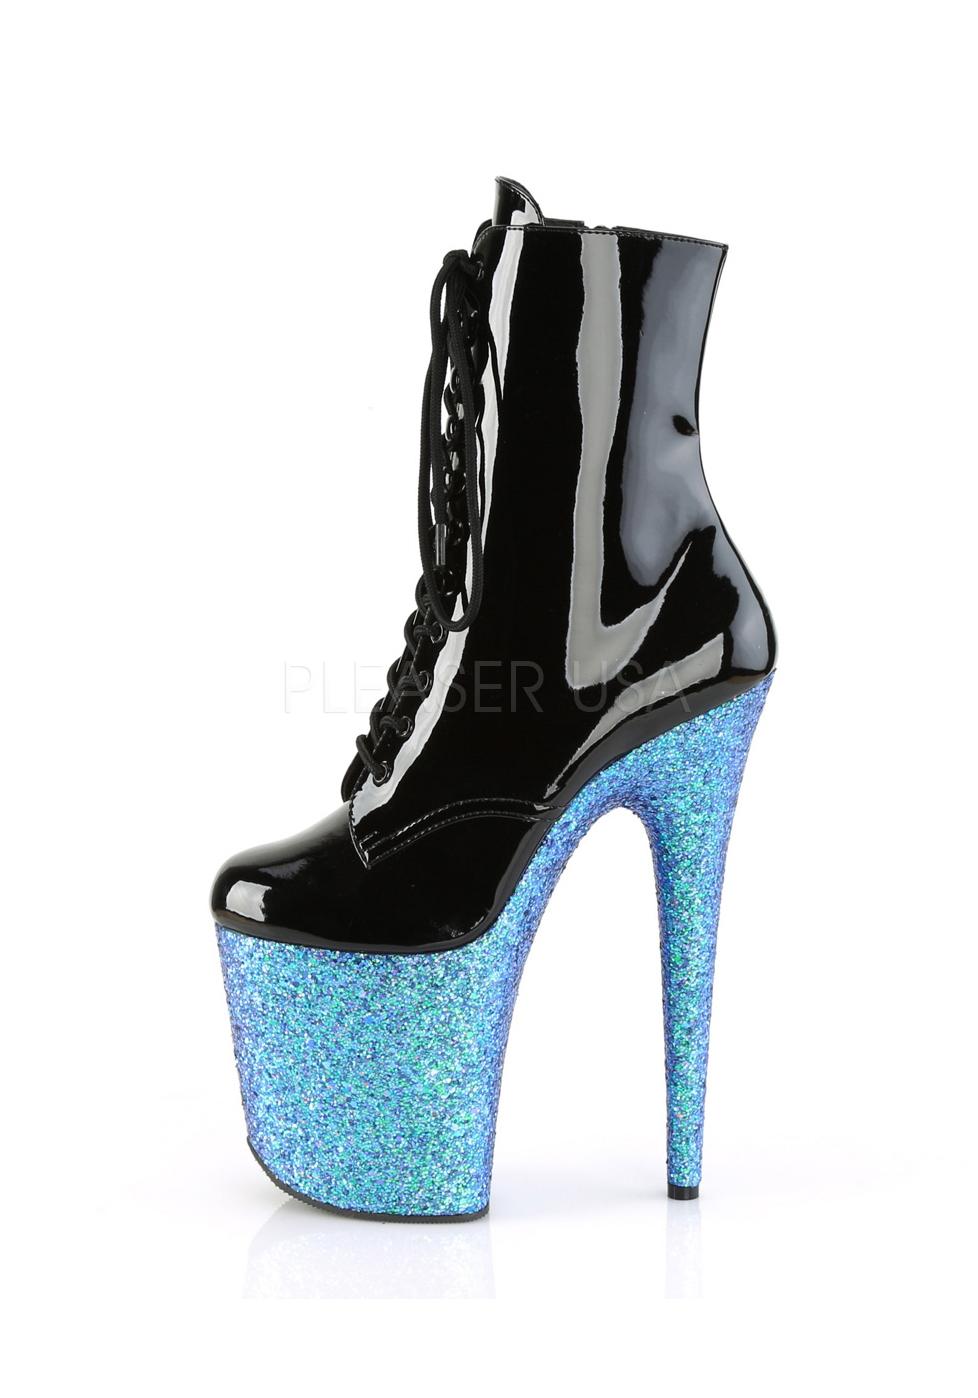 "Side Zip Pleaser FLAMINGO-1020LG 8/"" Heel 4/"" Platform Lace-Up Ankle Boot"